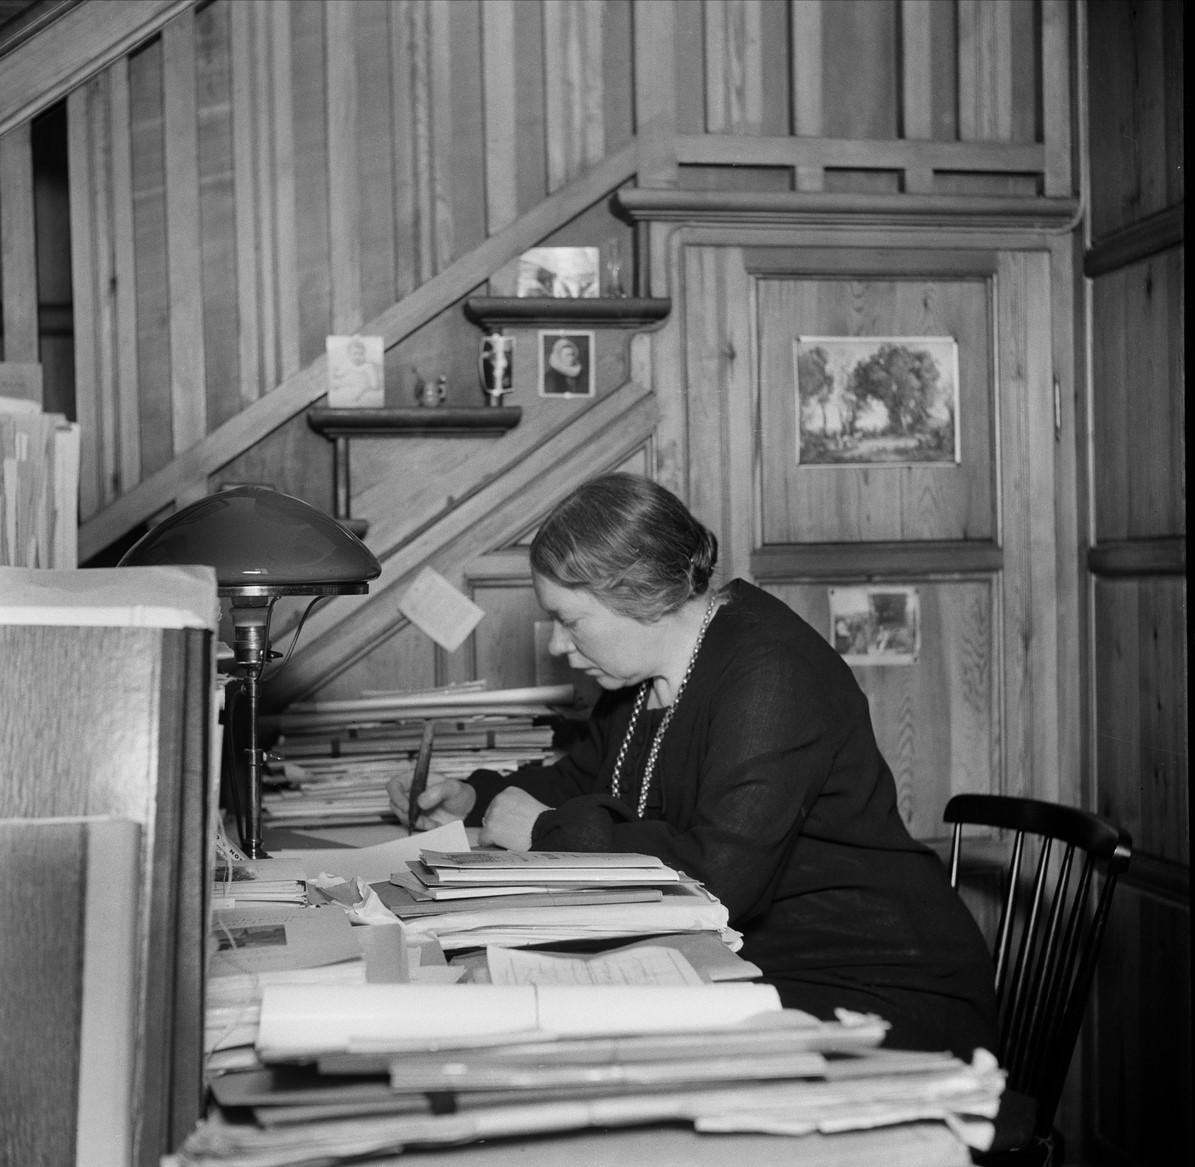 Laura Stridsberg at work at Nordiska museet, 1939. Photgrapher unknown (Nordiska museets arkiv, NMA.0055728)